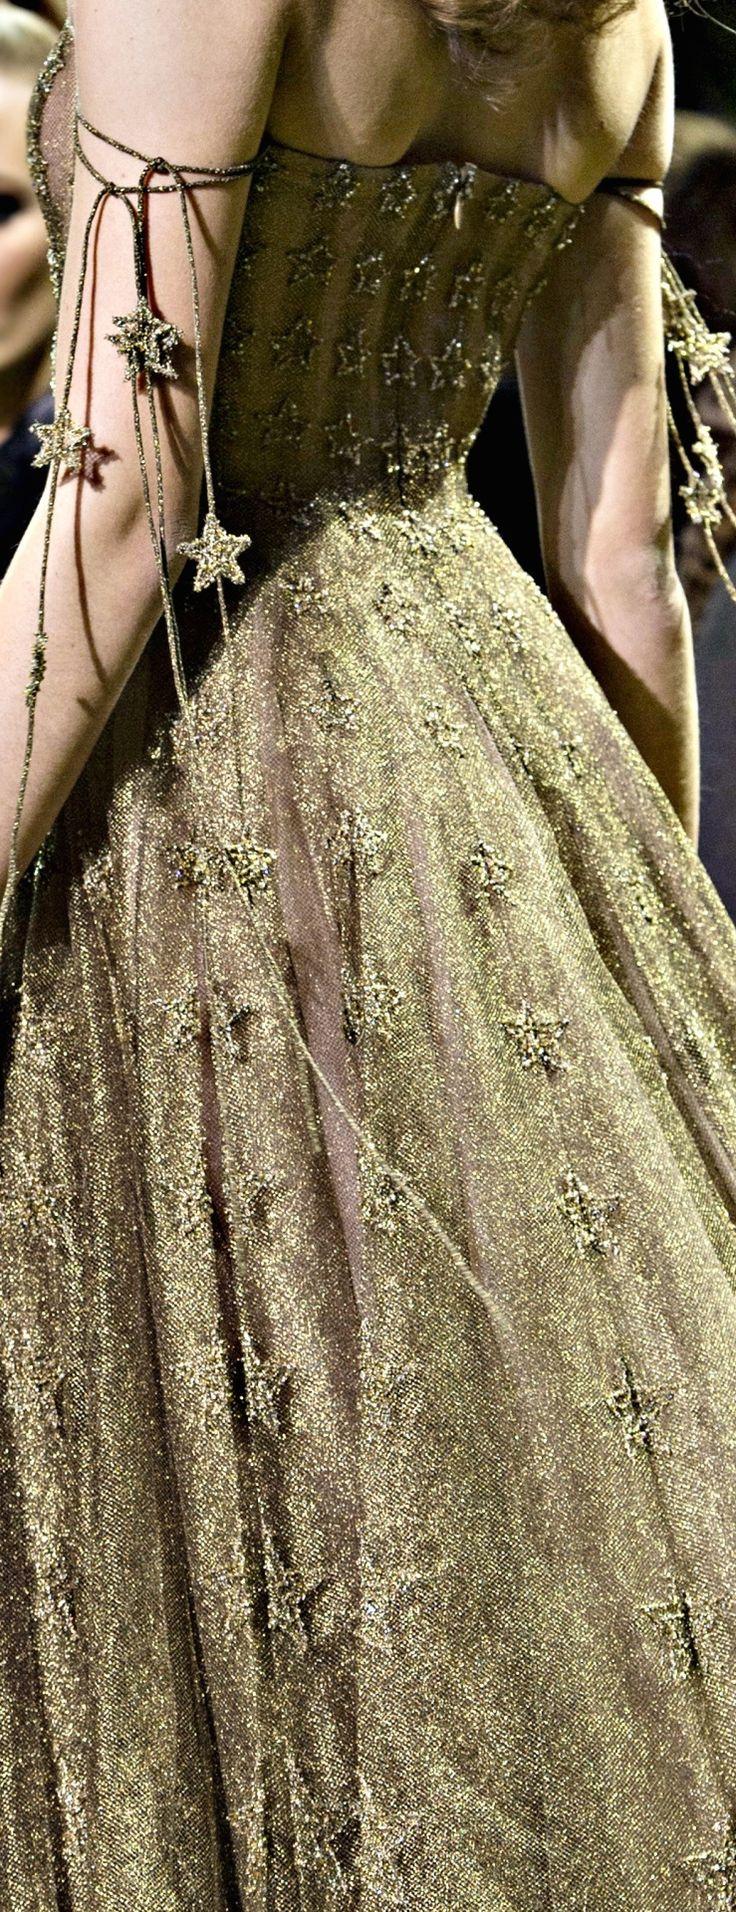 Dior Couture 2017 Crème de la Crème #Luxurydotcom